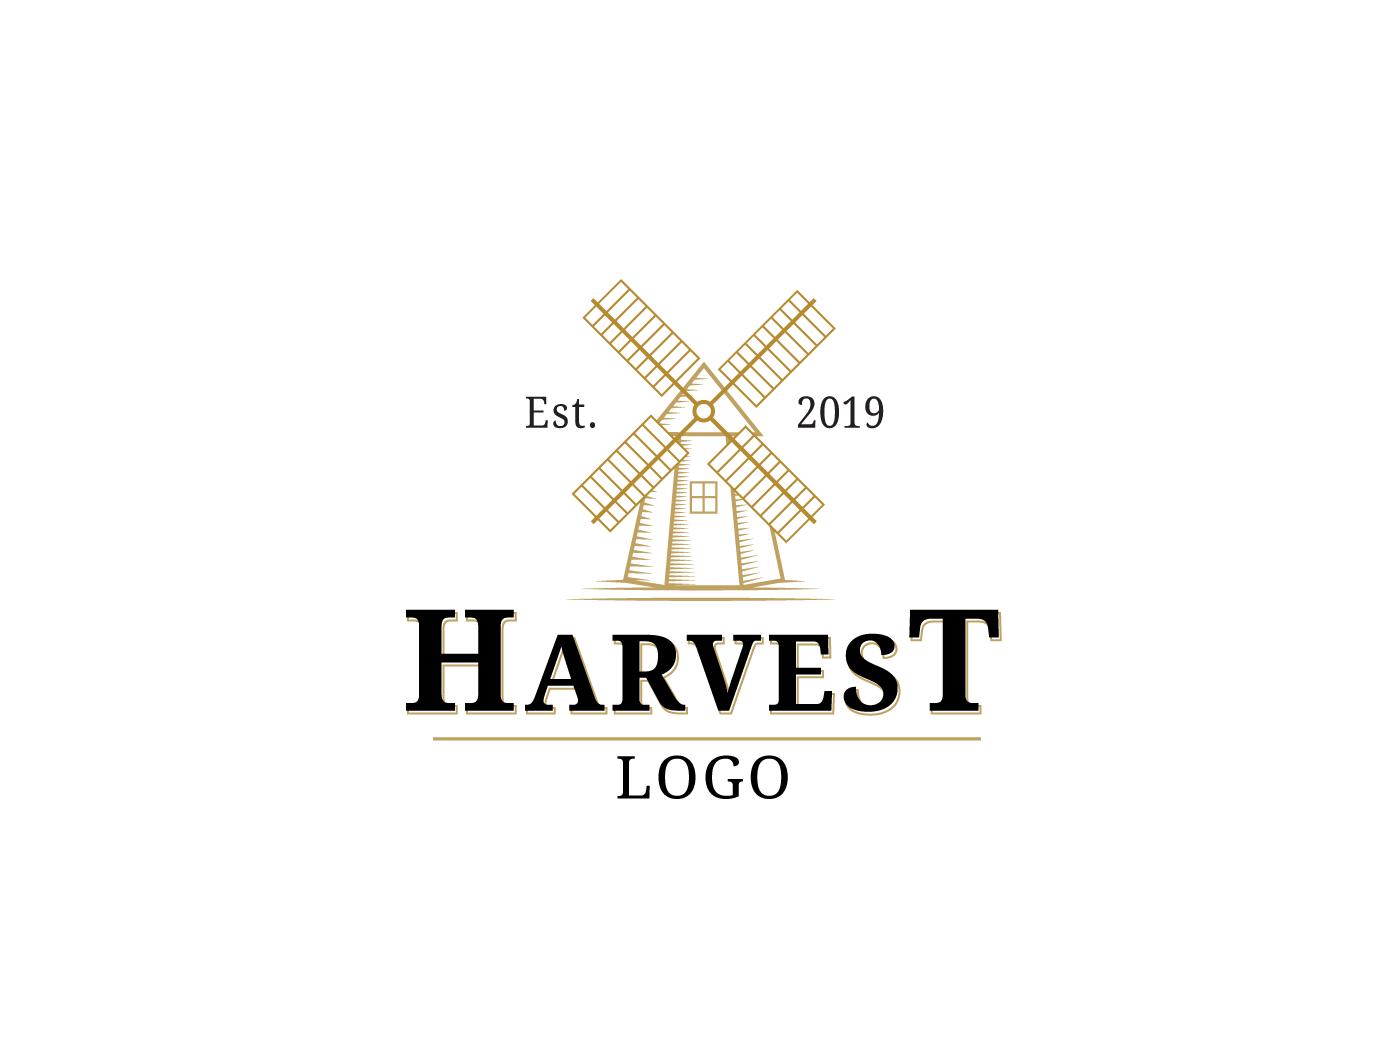 Harvest Logo by Nikoloz Molodinashvili on Dribbble.